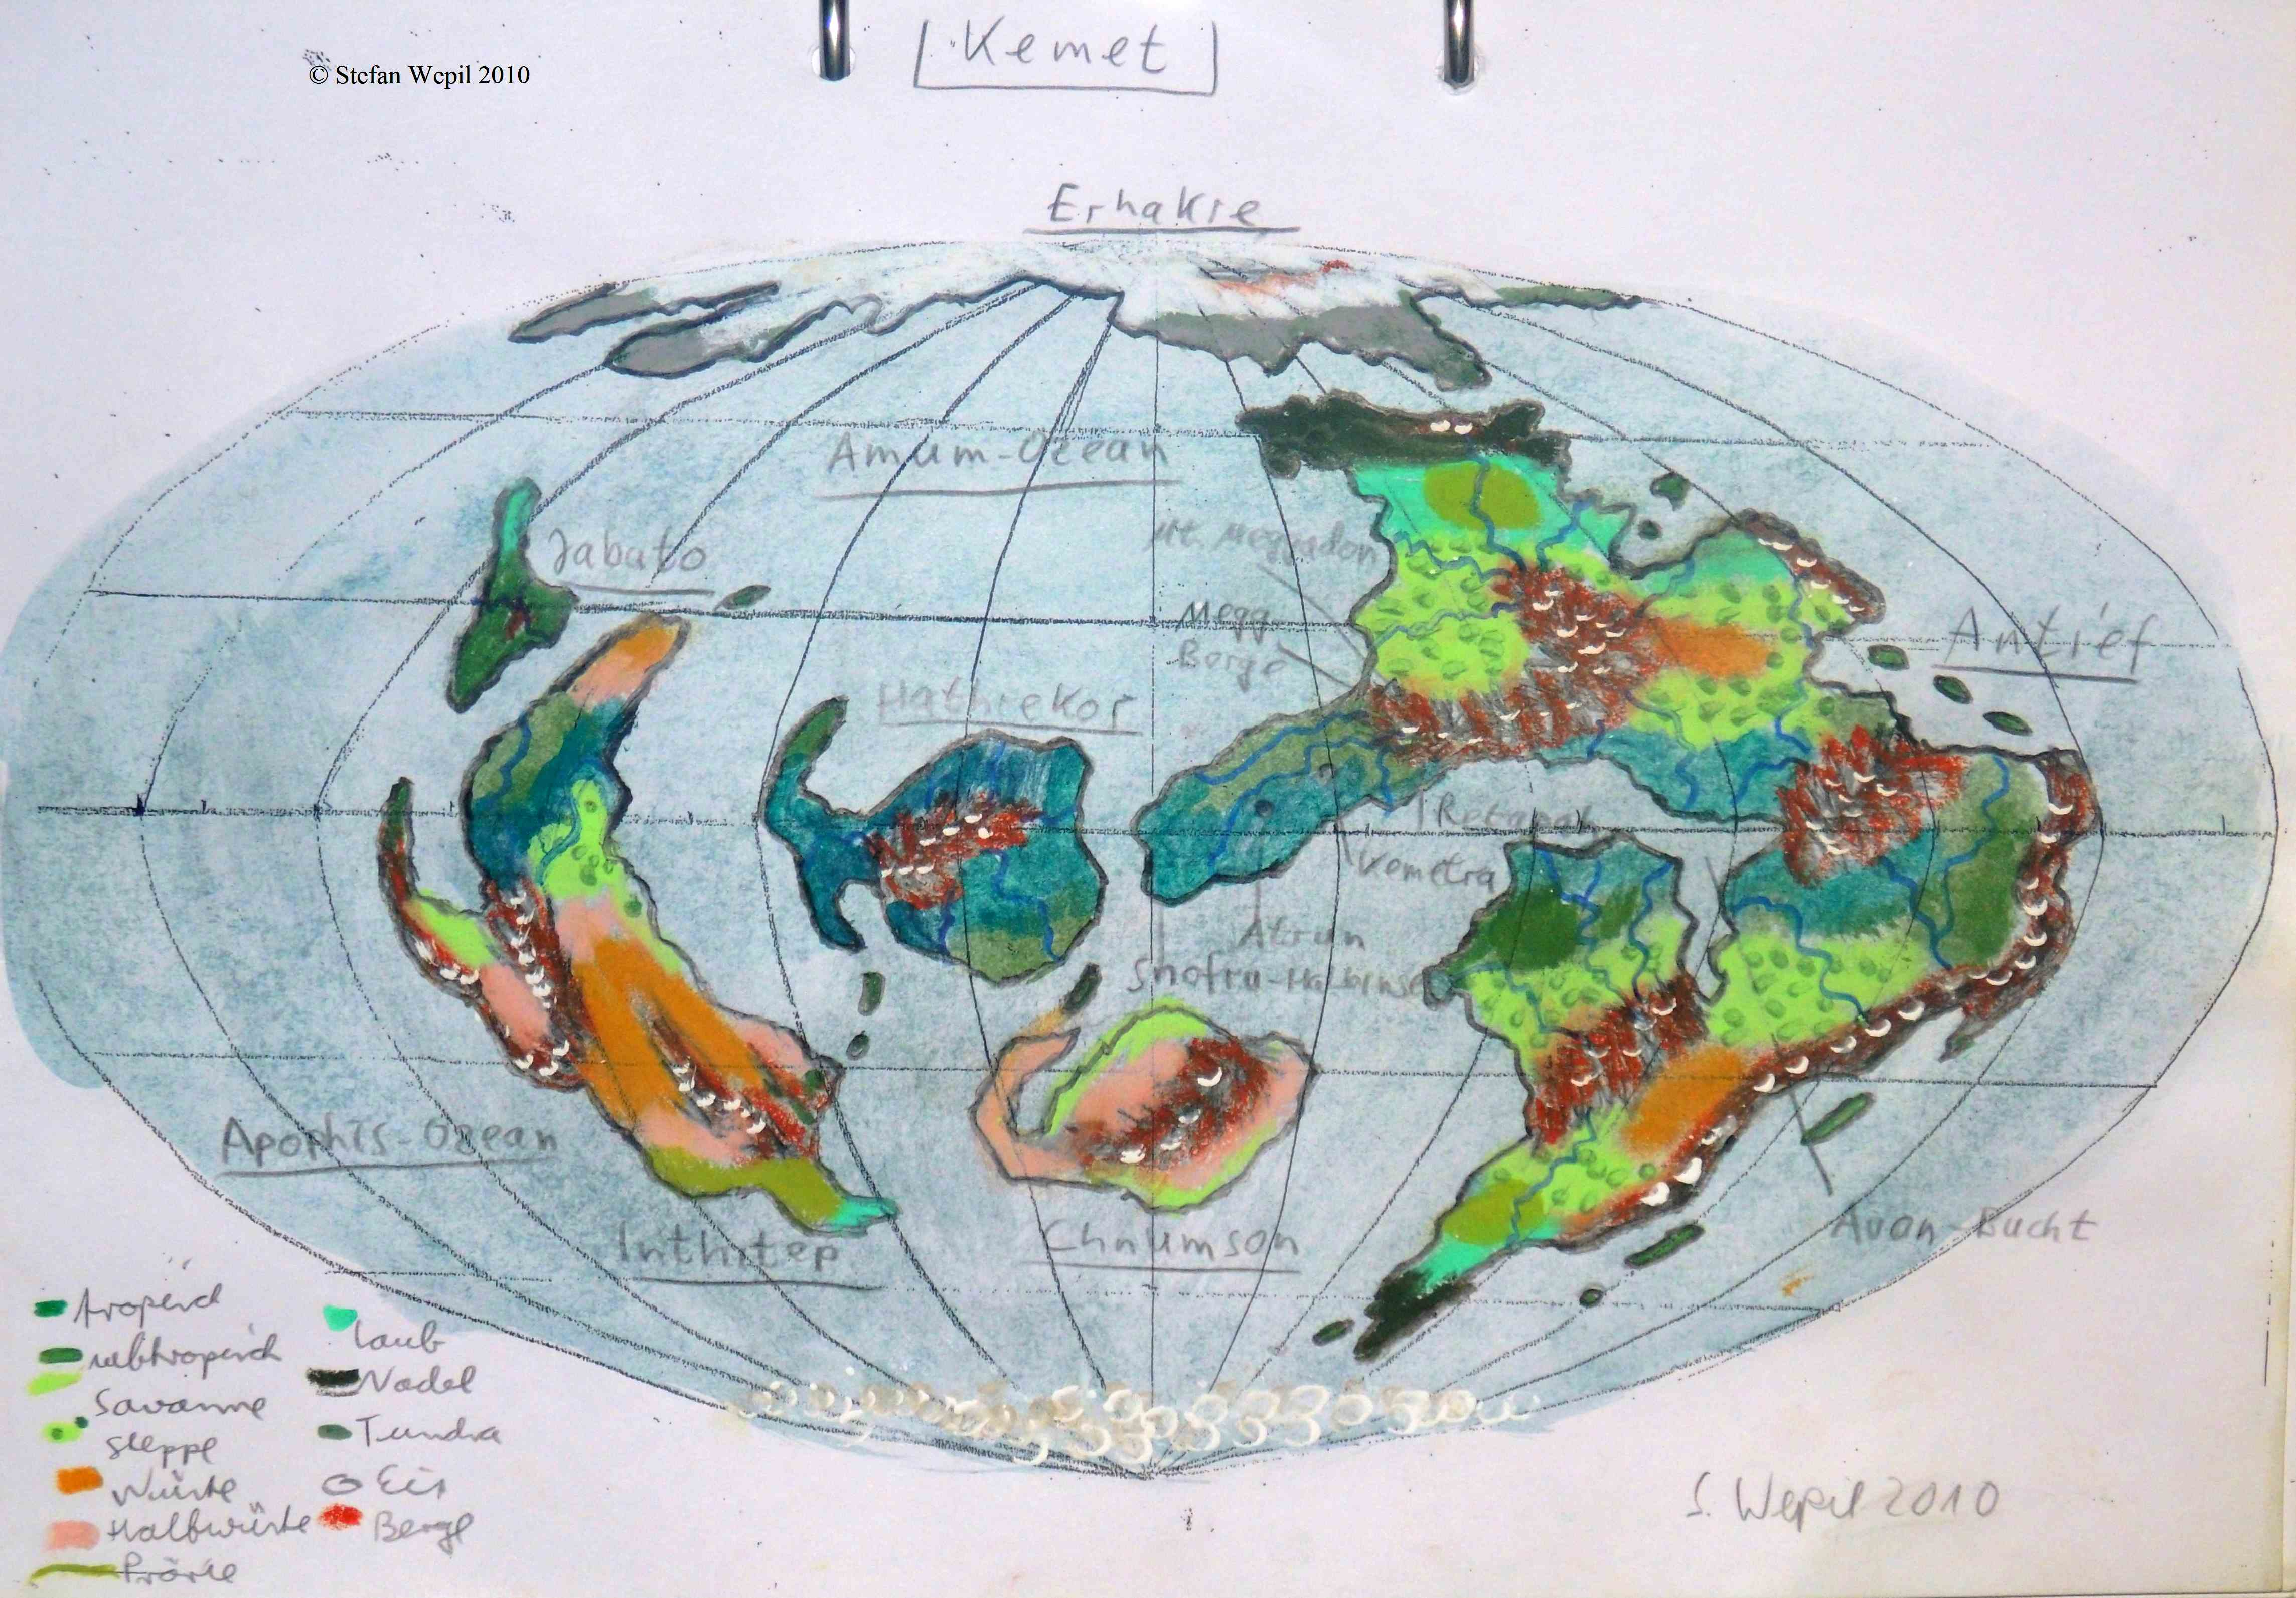 Planetenkarte von Kemet (C) Stefan Wepil